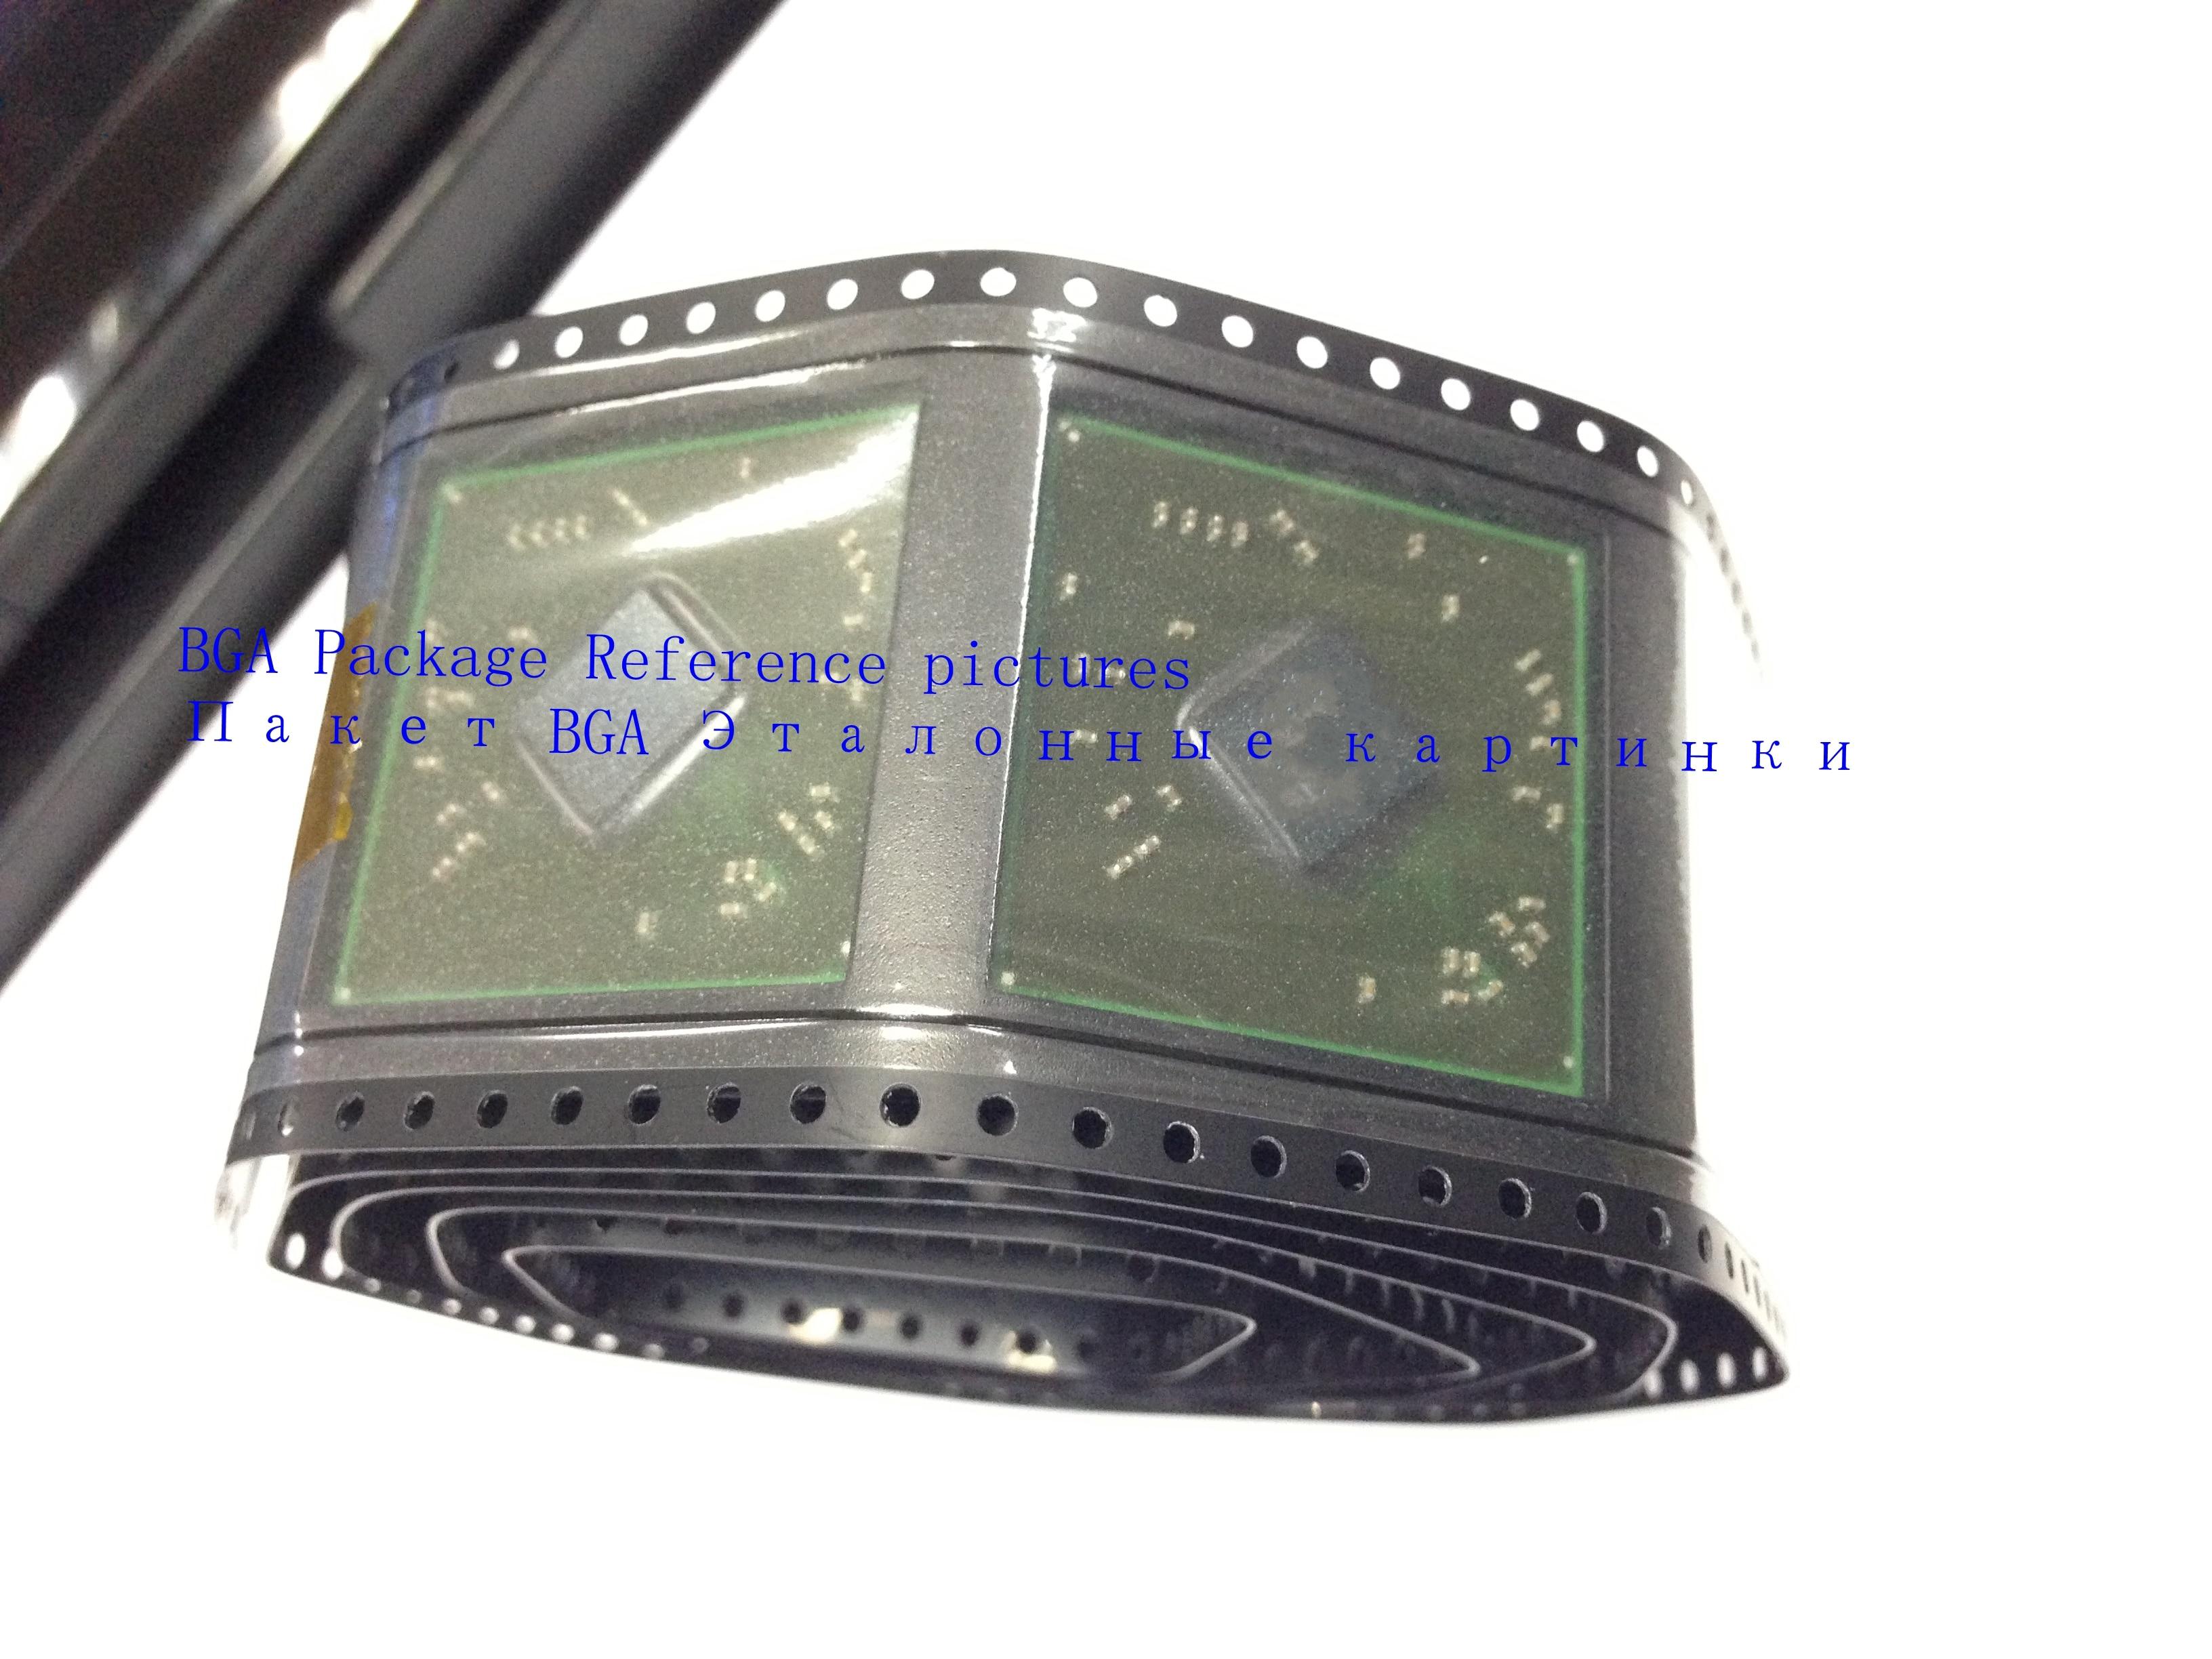 1pcs/lot 100% New N15V-GM-B-A2 N15V GM B A2 BGA Chipset1pcs/lot 100% New N15V-GM-B-A2 N15V GM B A2 BGA Chipset